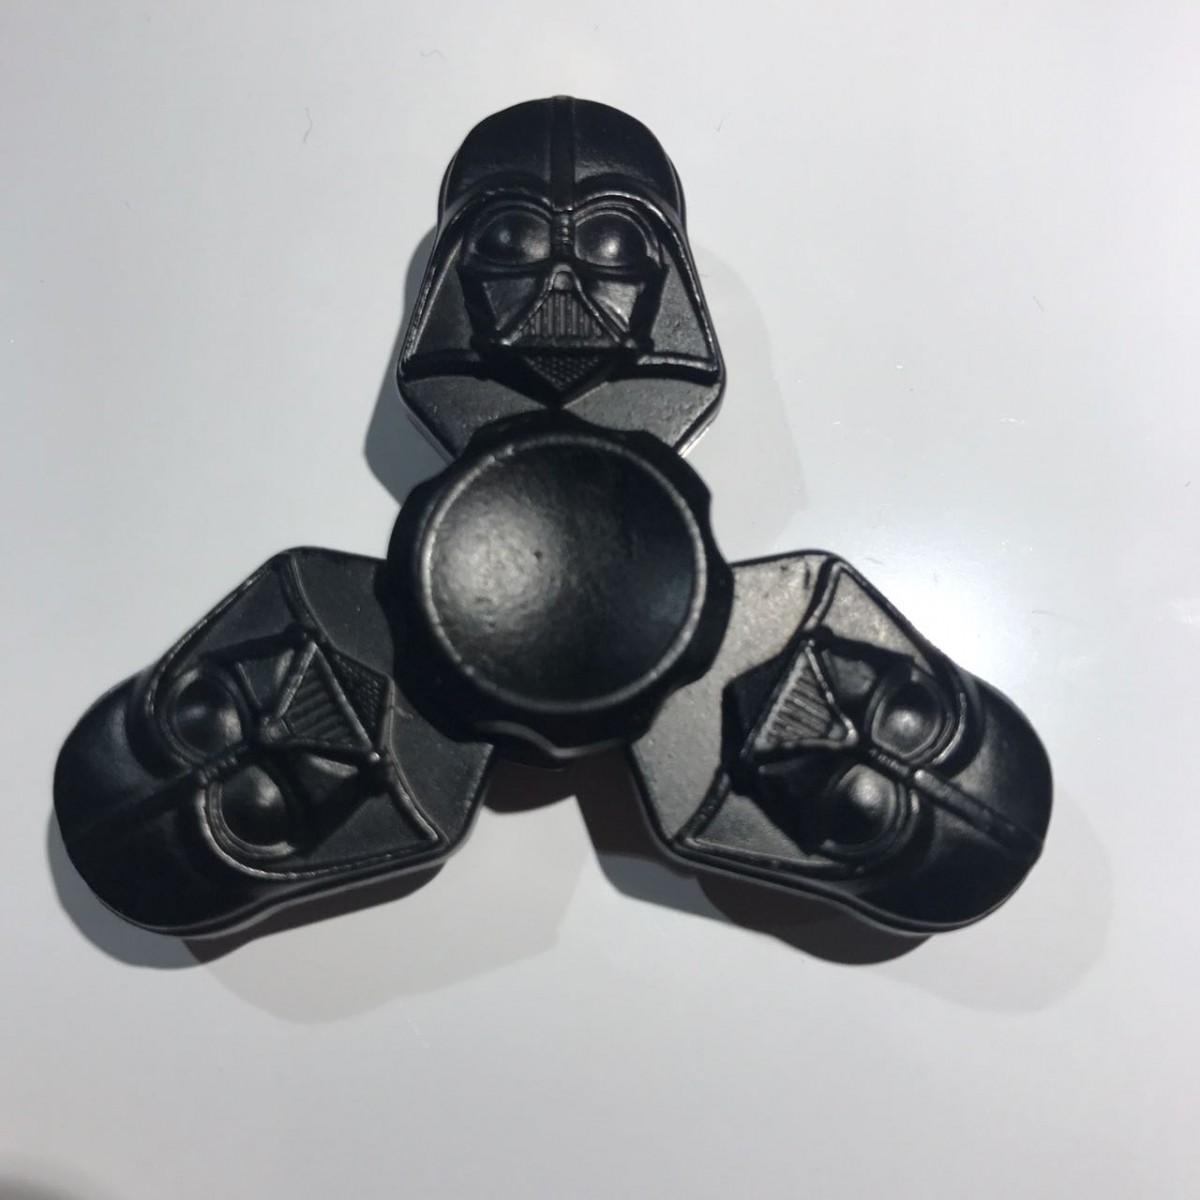 Hand Spinner Darth Vader - Rolamento Anti Estresse Fidget Hand Spinner